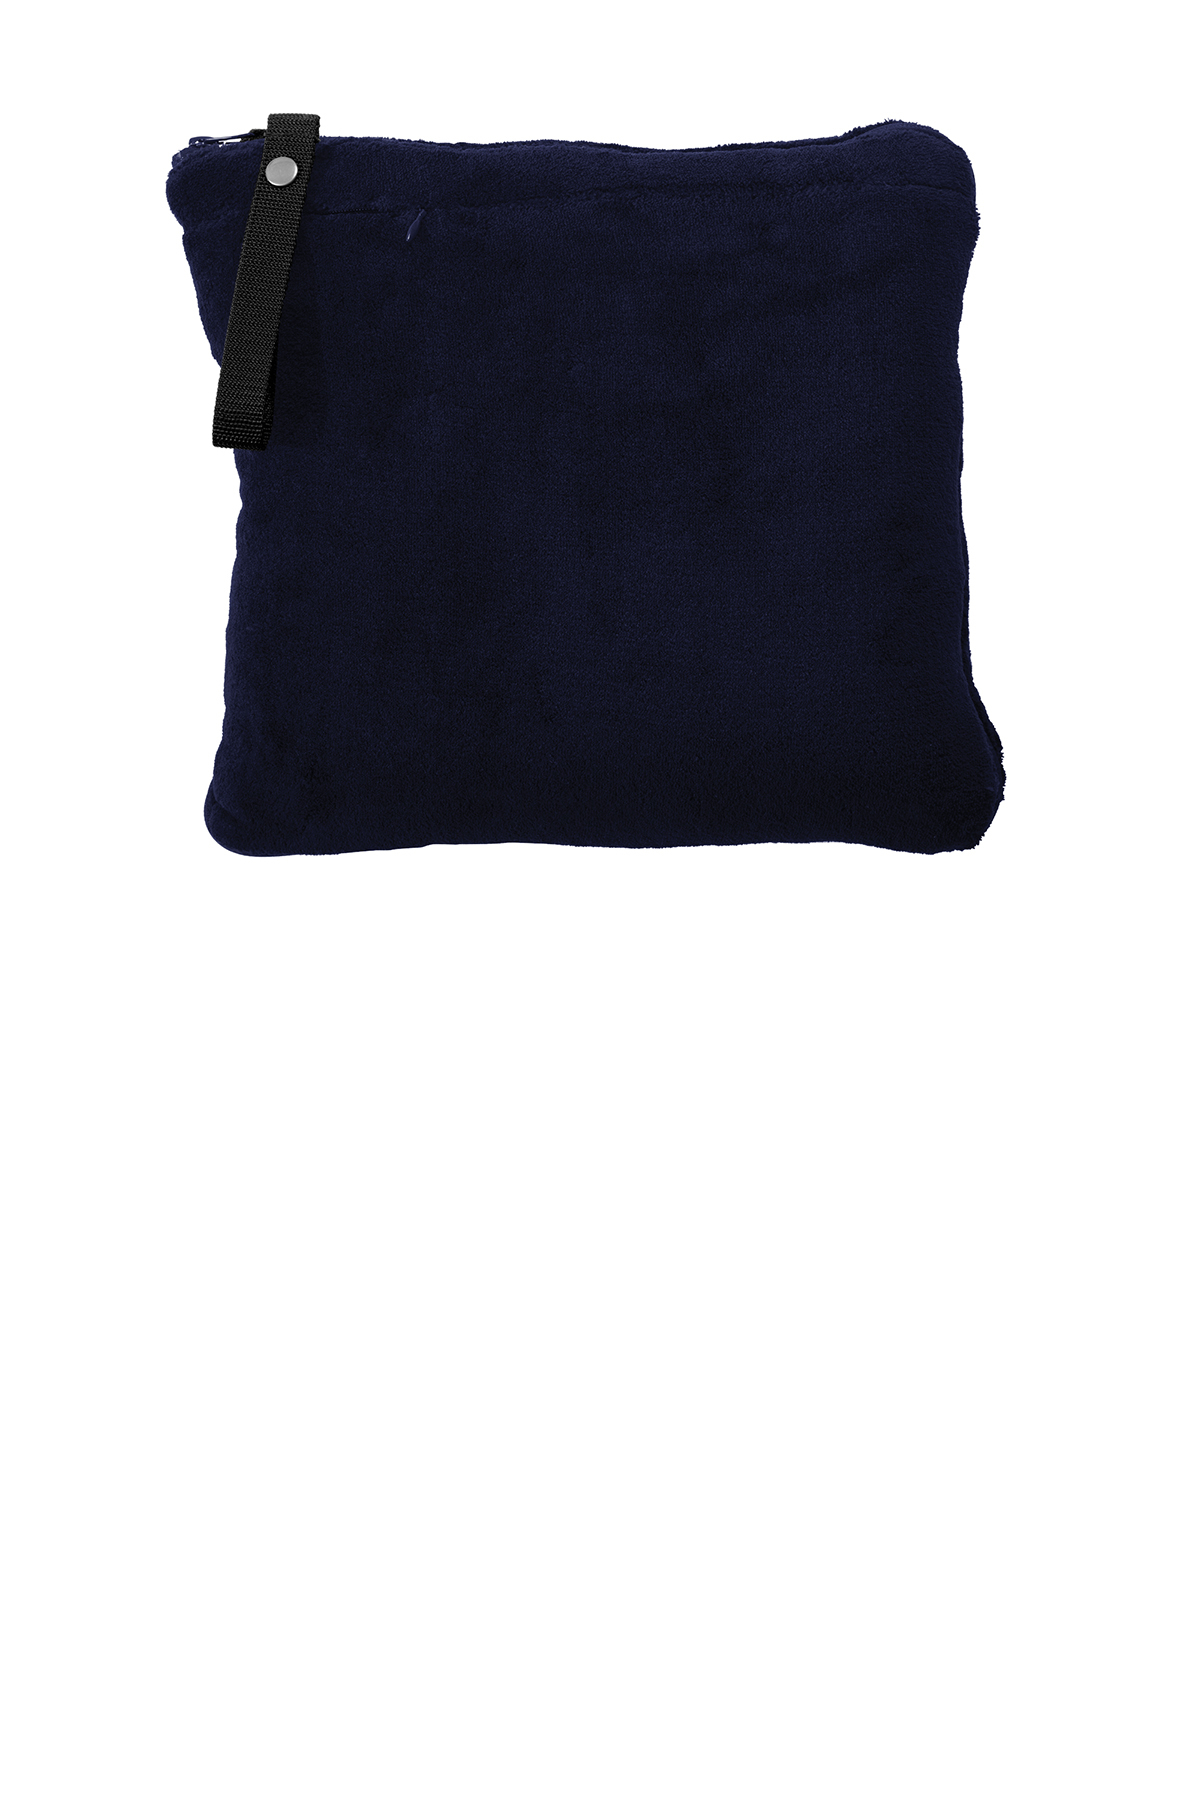 Port Authority BP75 - Packable Travel Blanket